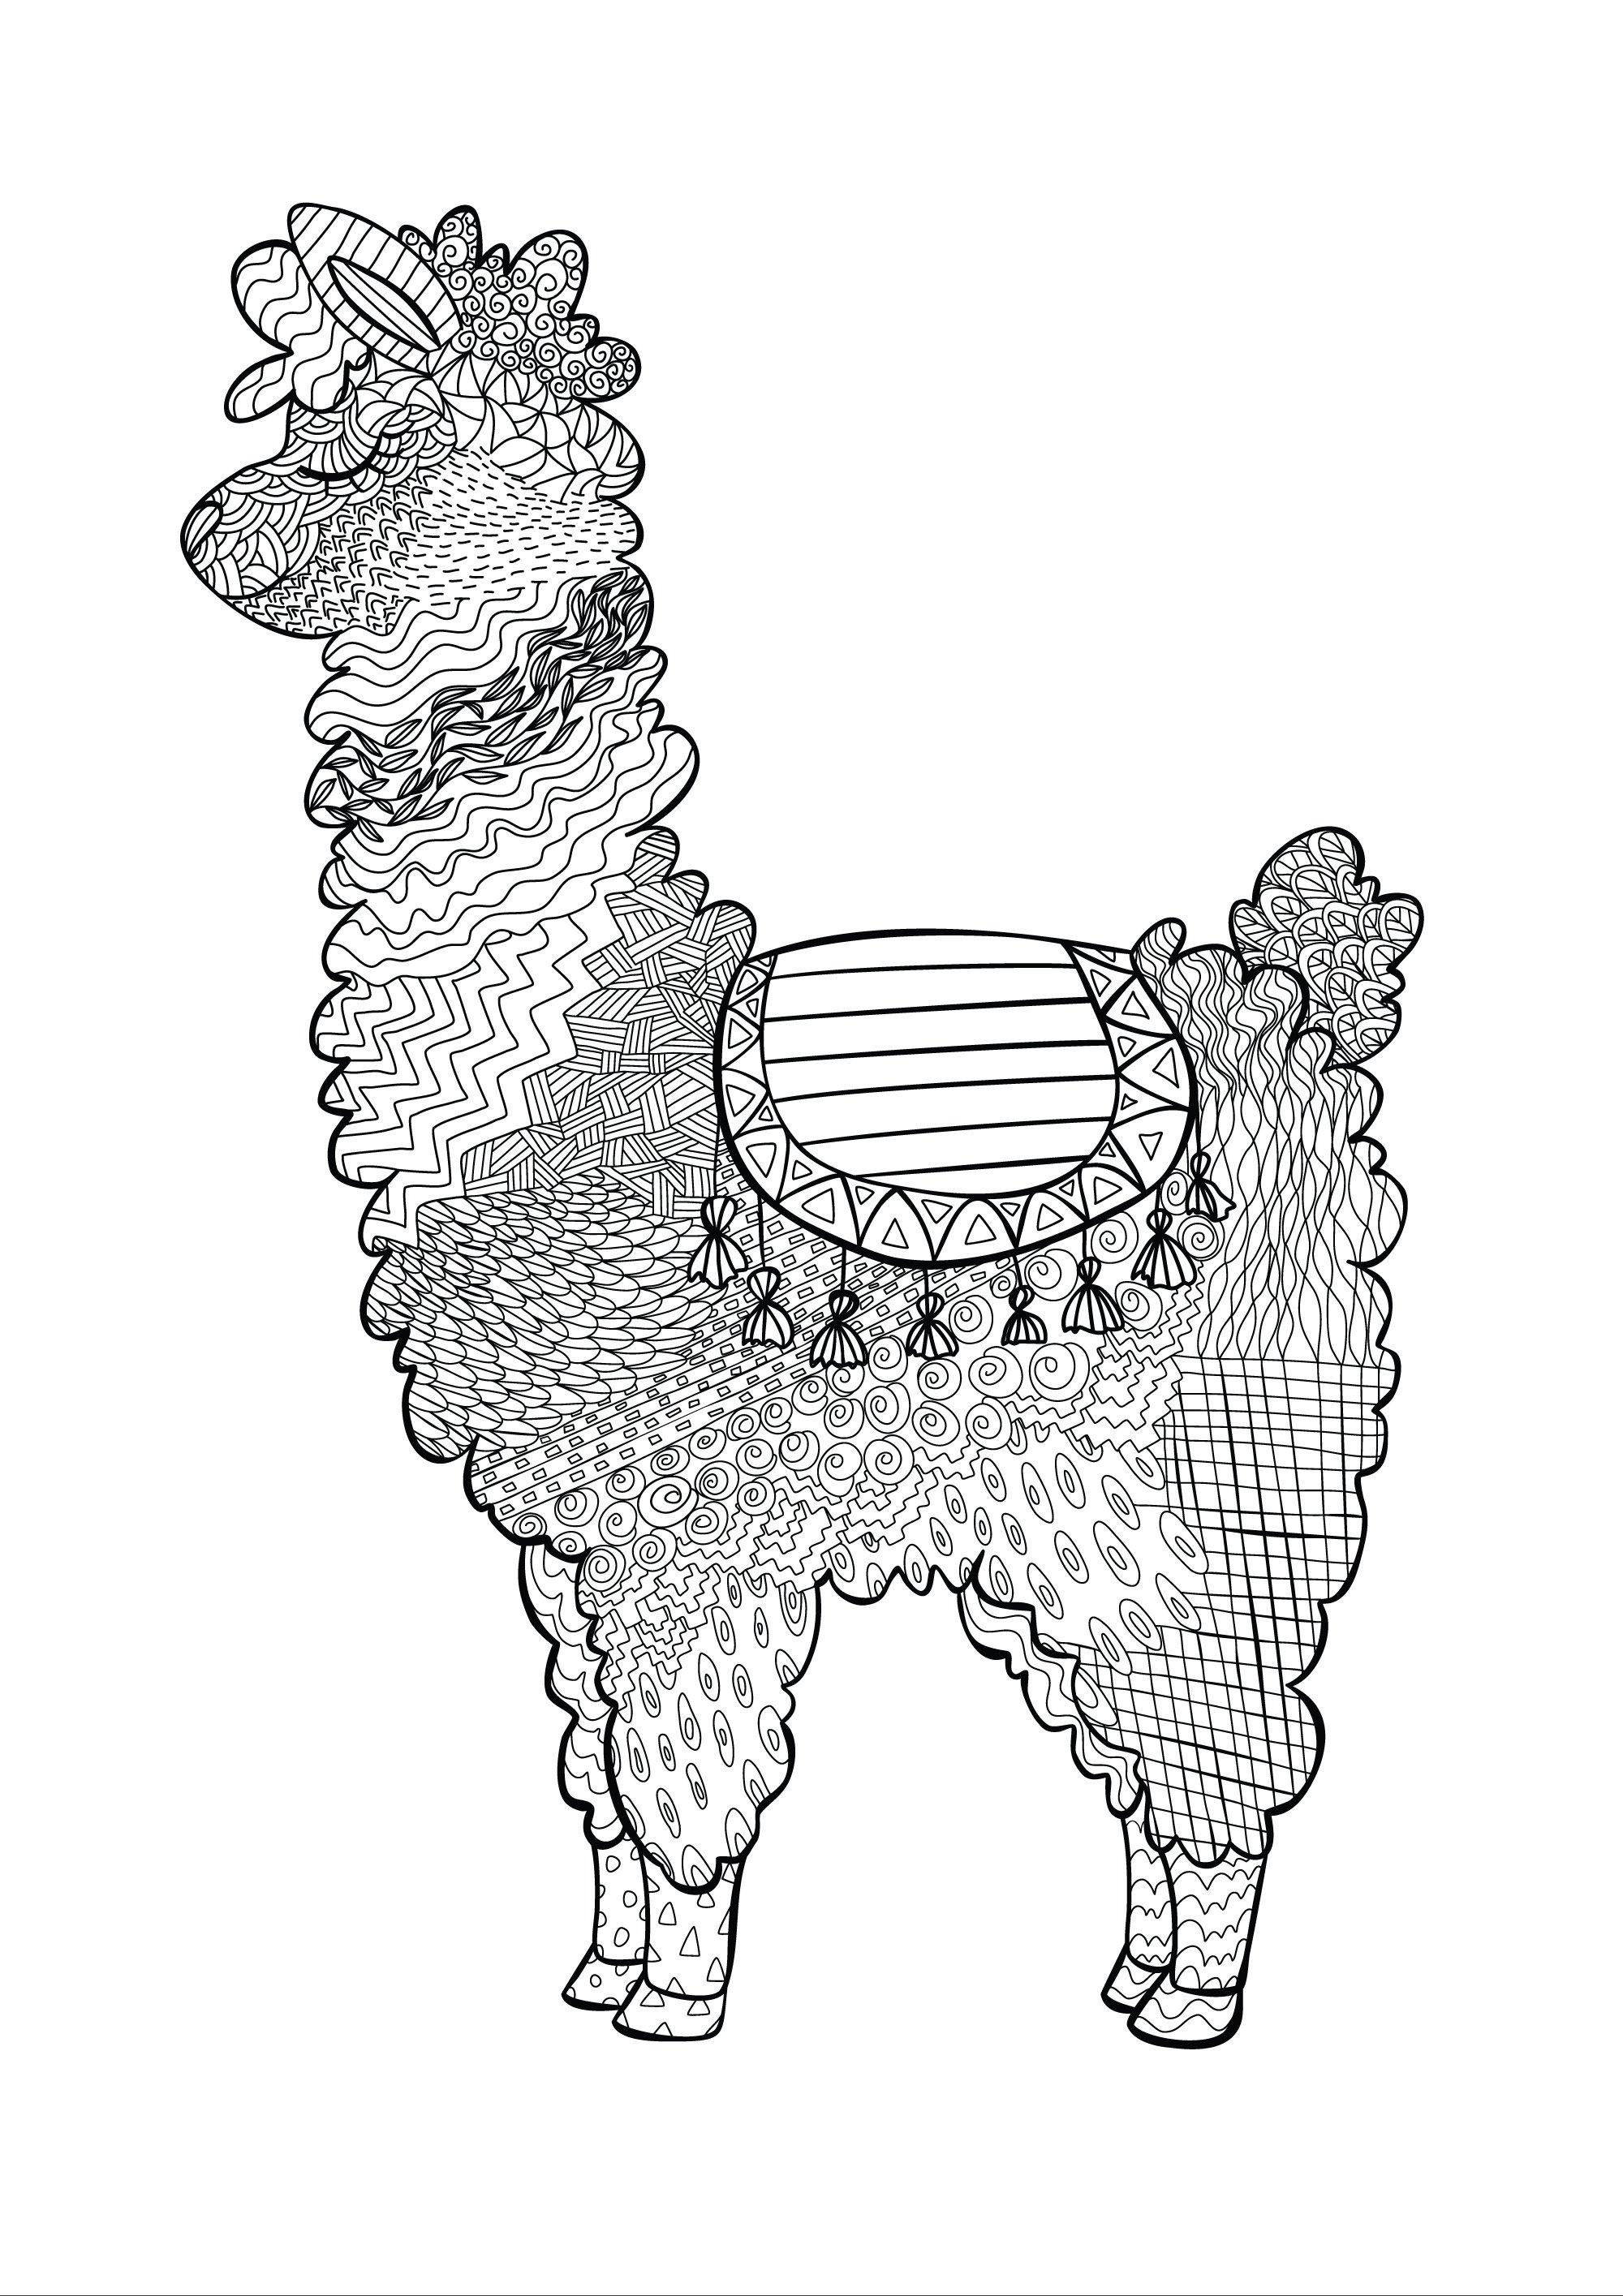 alpaca printable colouring page lama animal coloring book 687293 characters design bundles alpaca printable colouring page lama animal coloring book